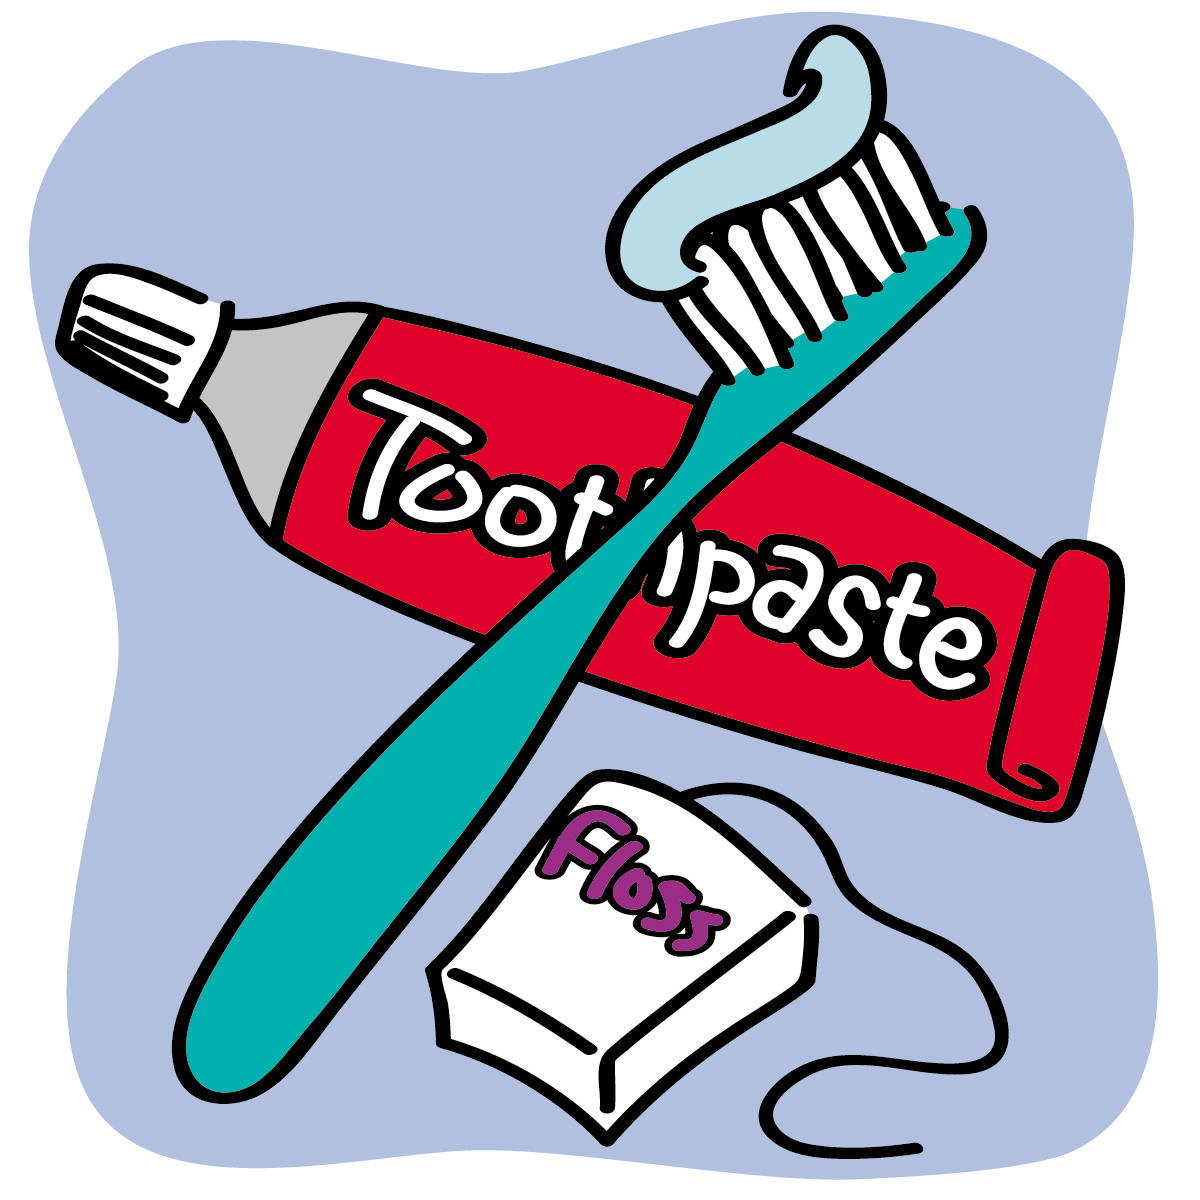 Dental-Health-Clip-Art.jpg